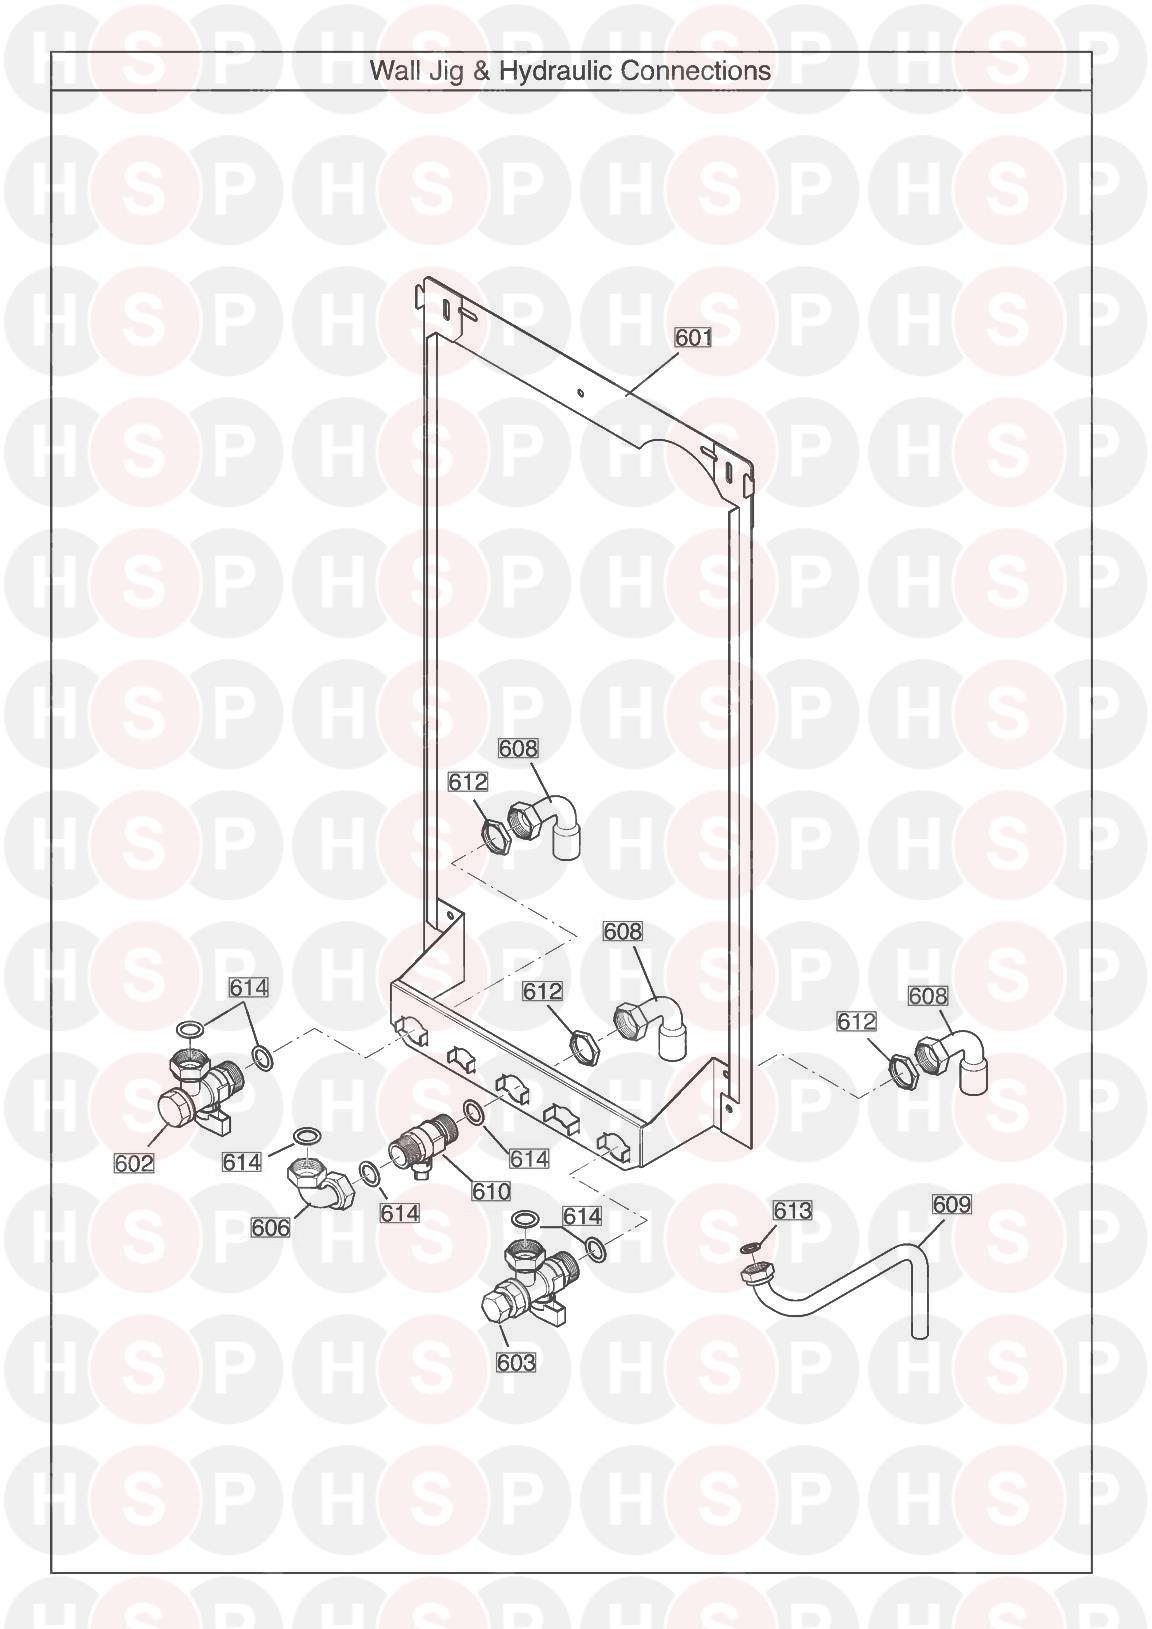 potterton promax system 18 erp  wall jig  diagram